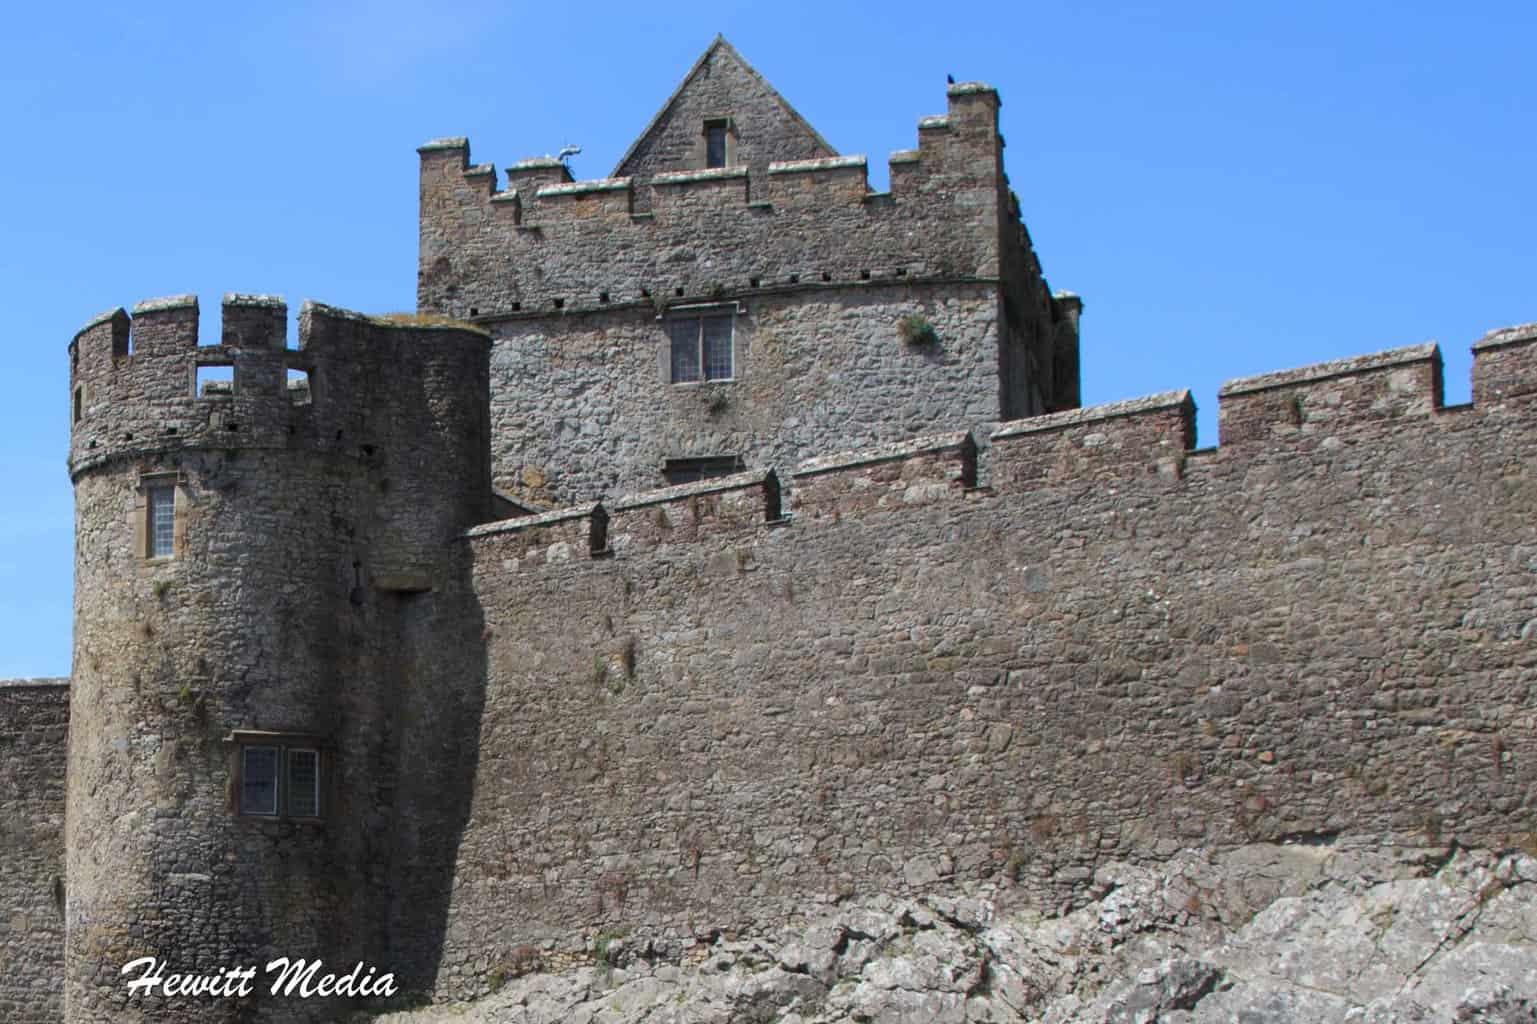 The castle's defenses